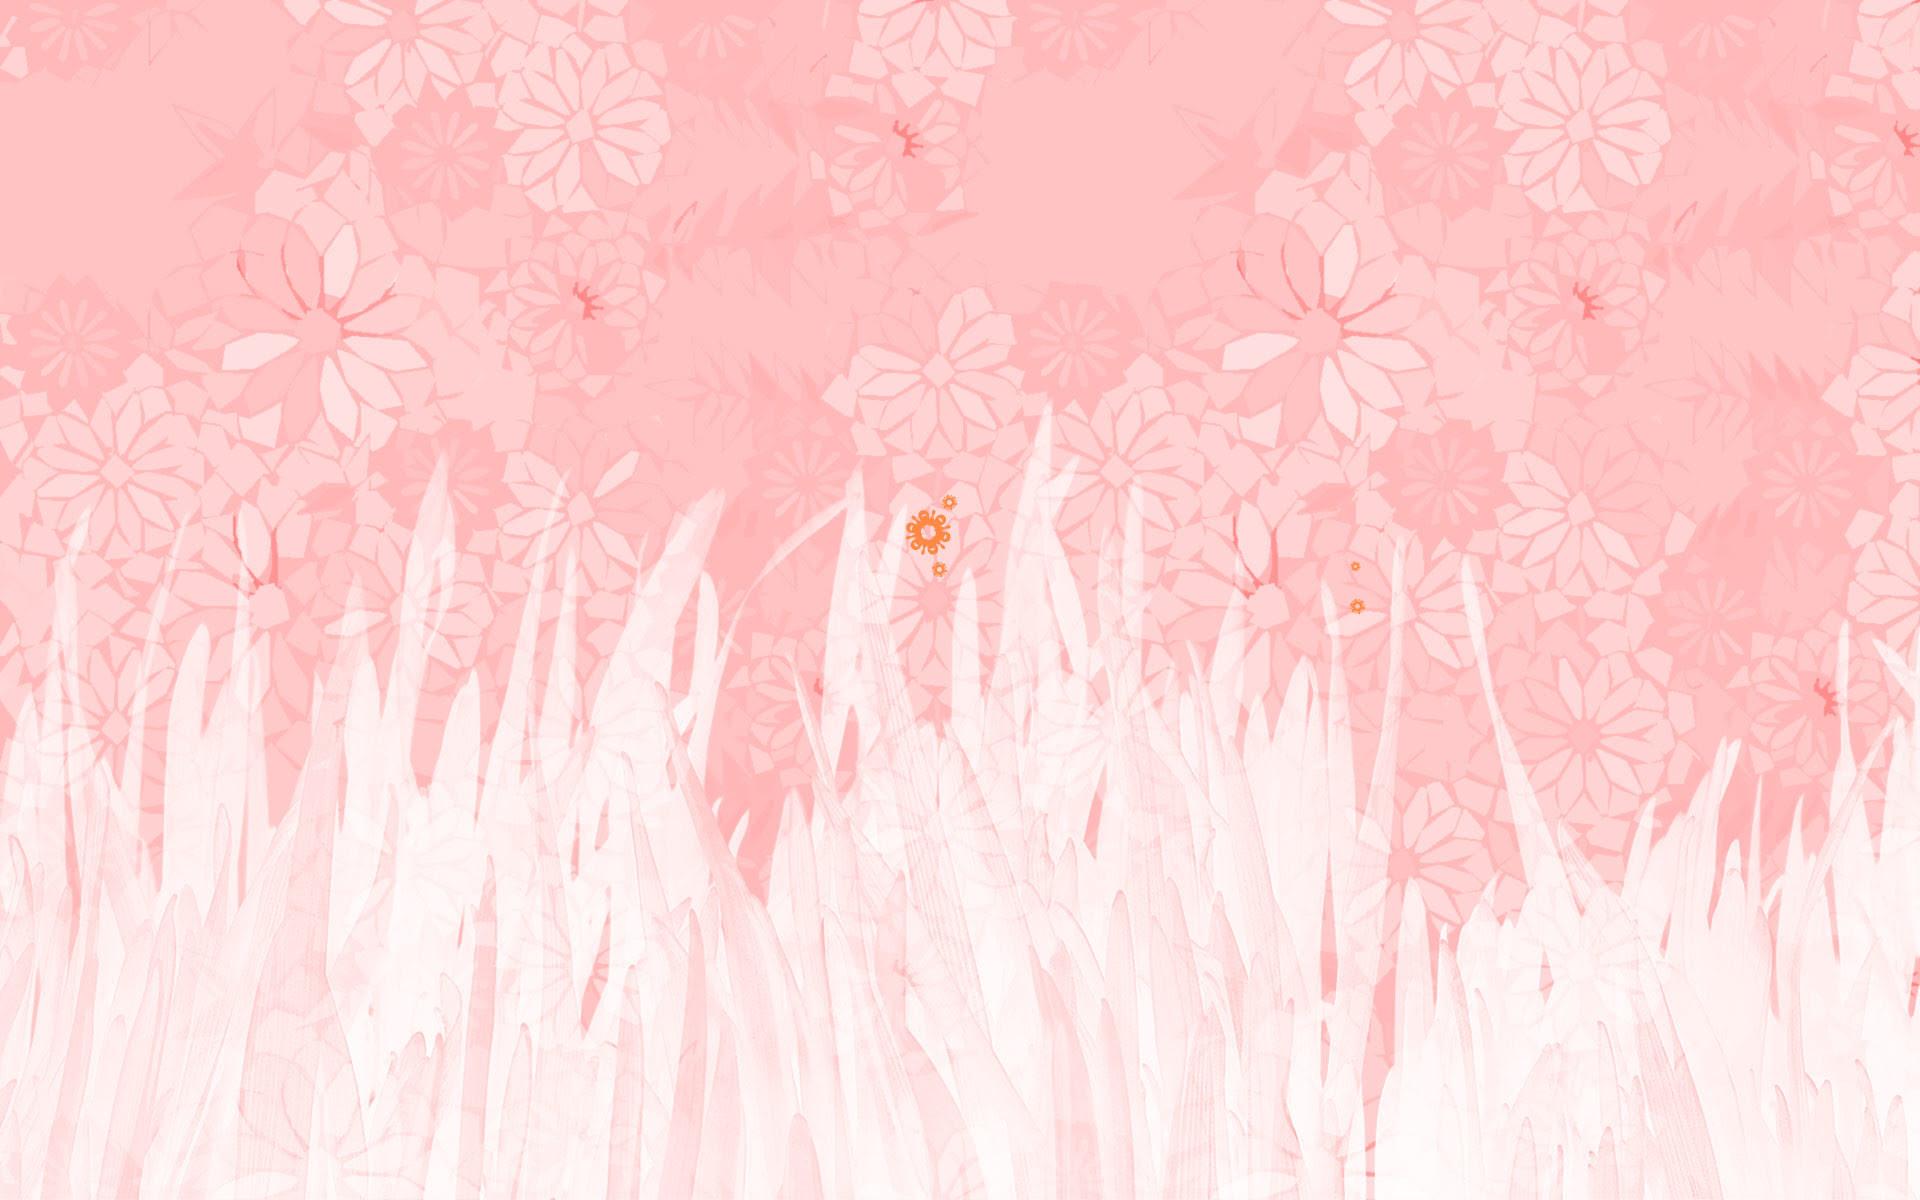 40 Beautiful Pastel Pink Aesthetic Wallpaper Desktop Hd Summer Background